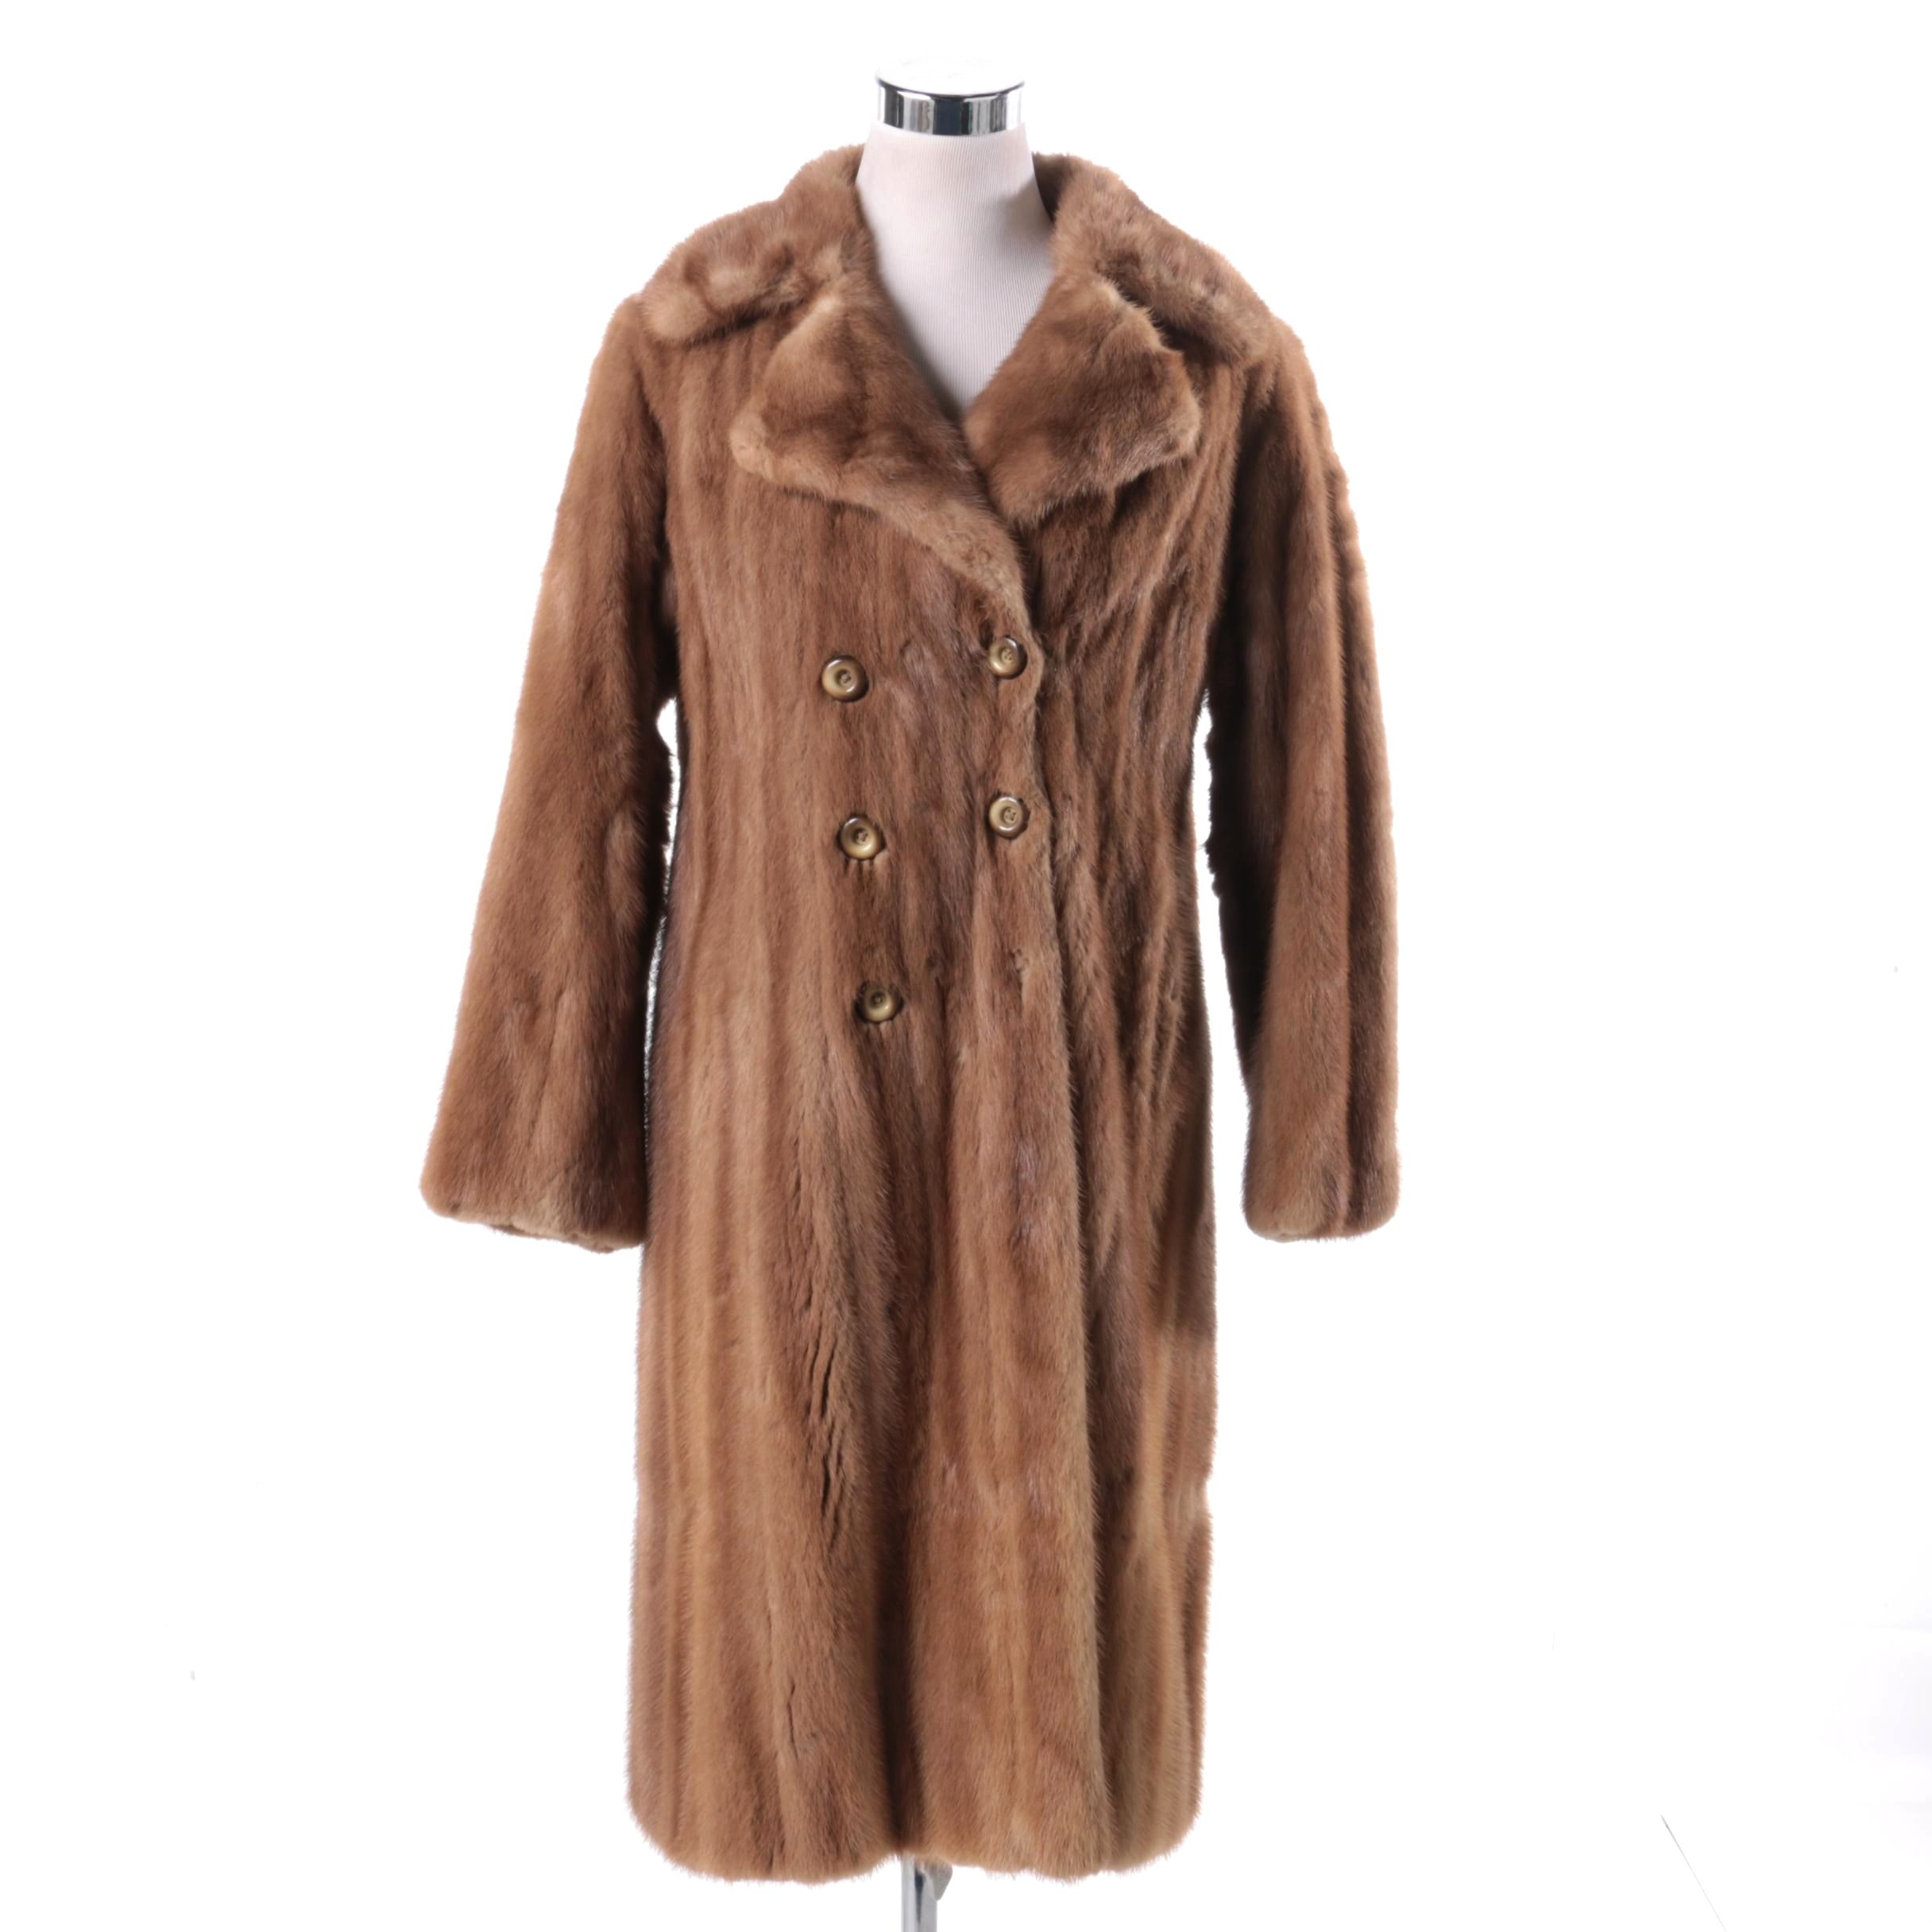 Women's Double Breasted Mink Fur Coat